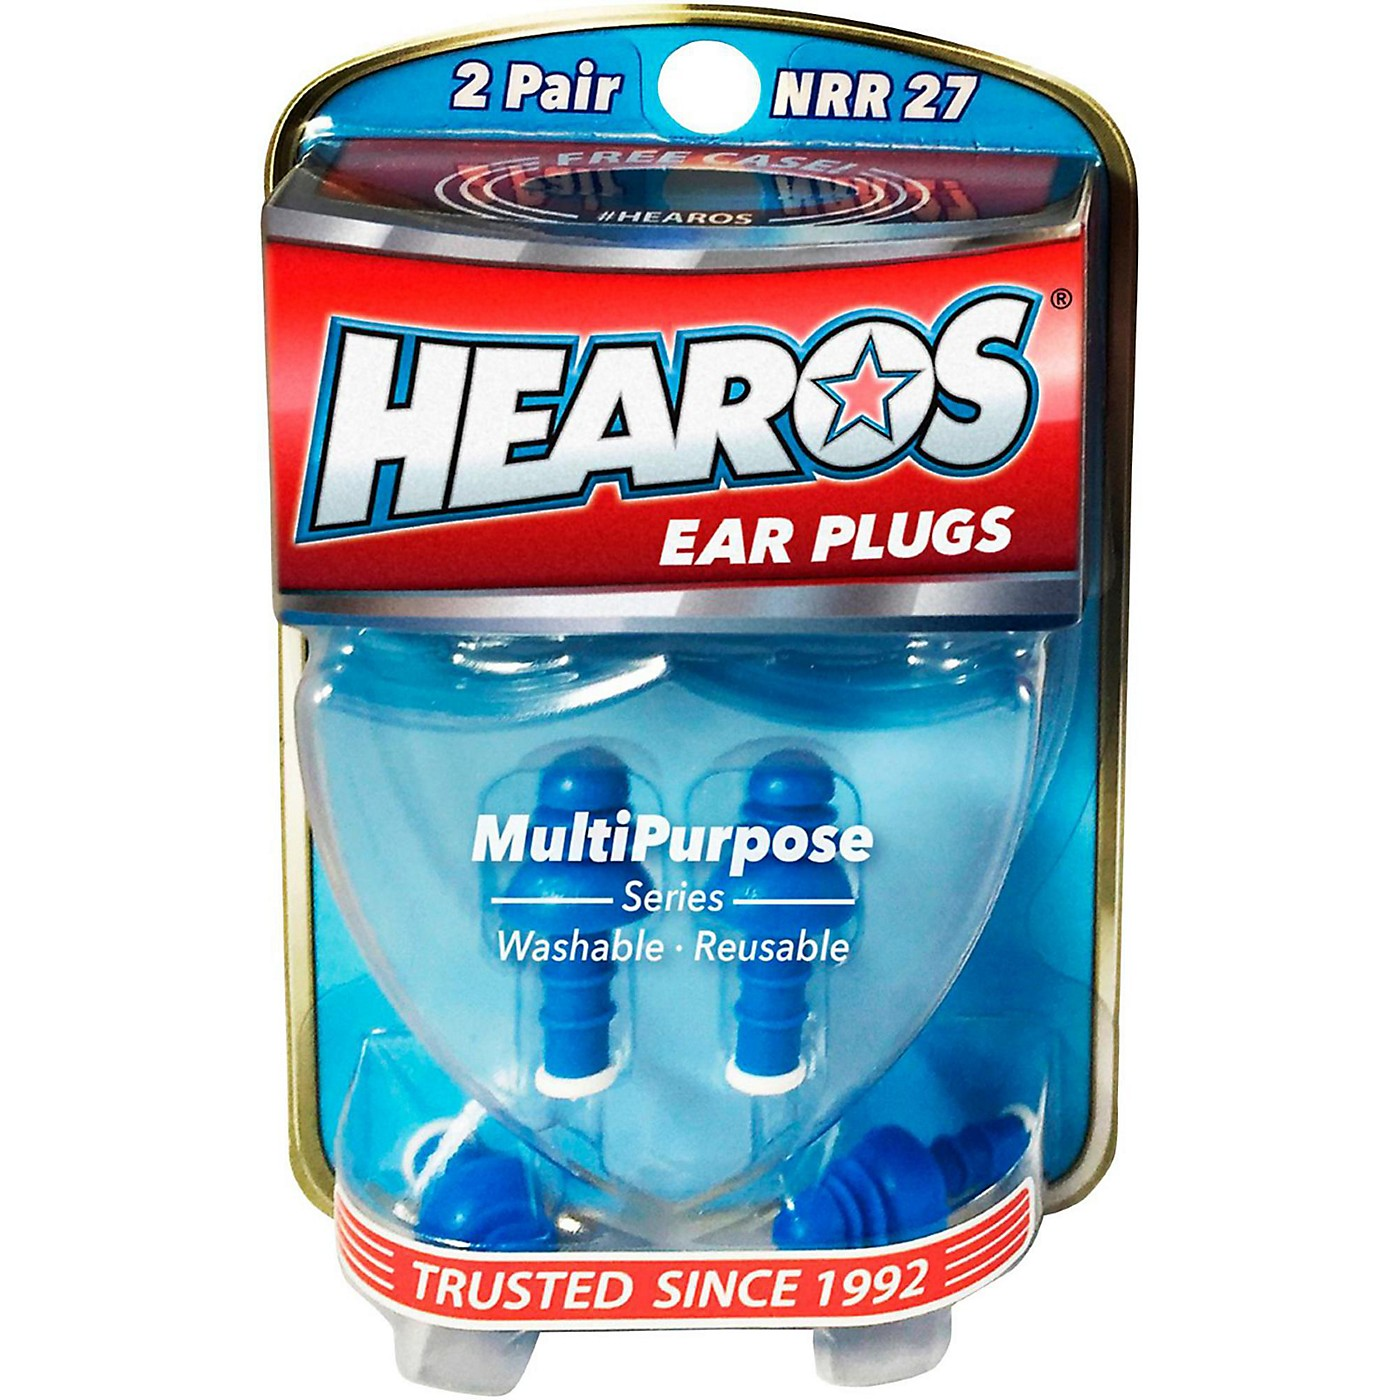 Hearos Multi-Purpose Series Ear Plugs 2 Pair + Free Case thumbnail